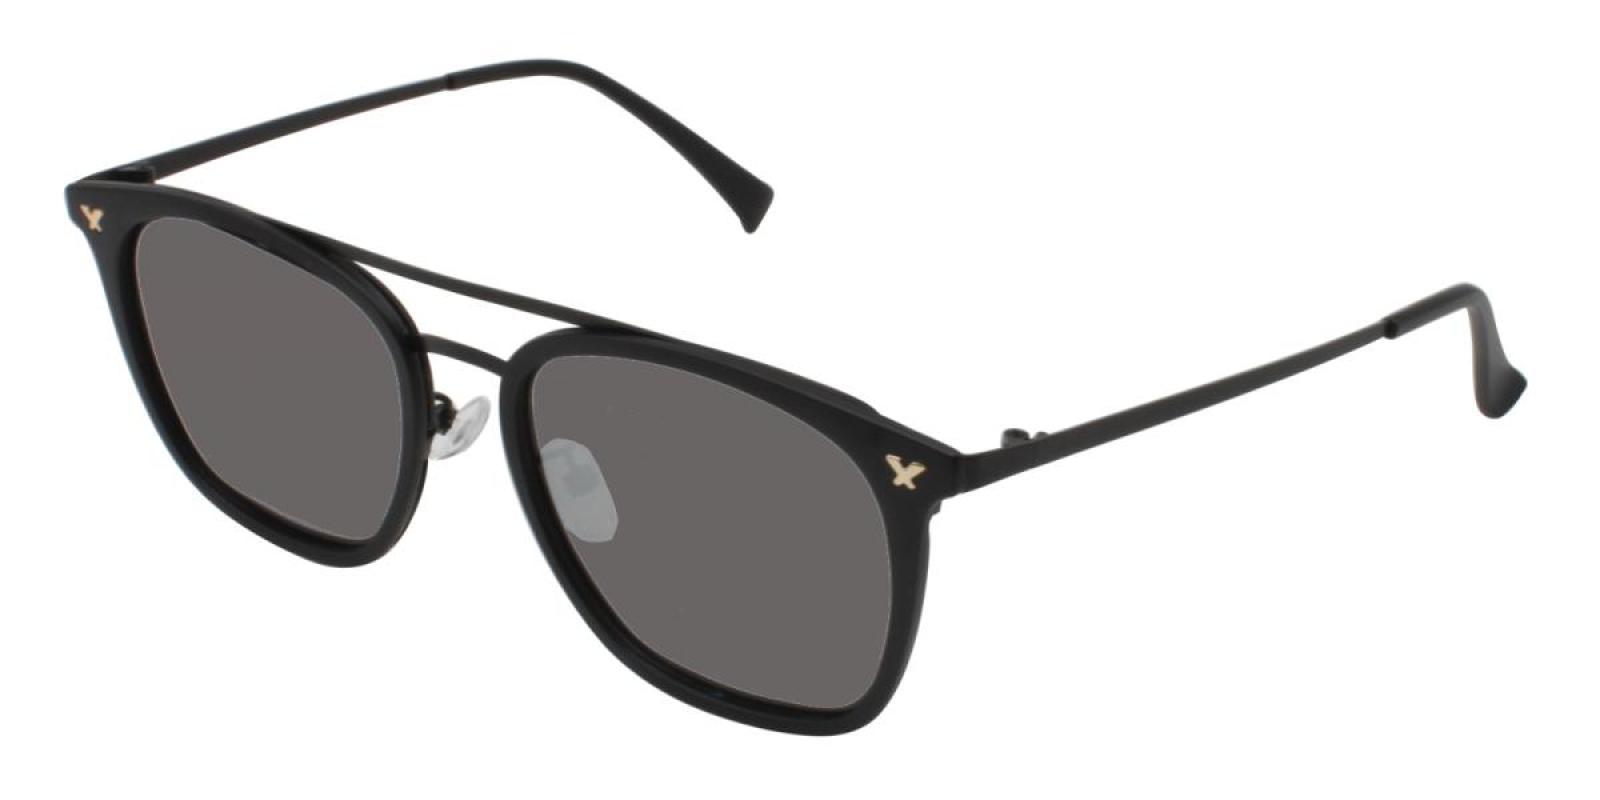 Seagual-Black-Aviator-Combination / Metal / TR-Sunglasses-additional1